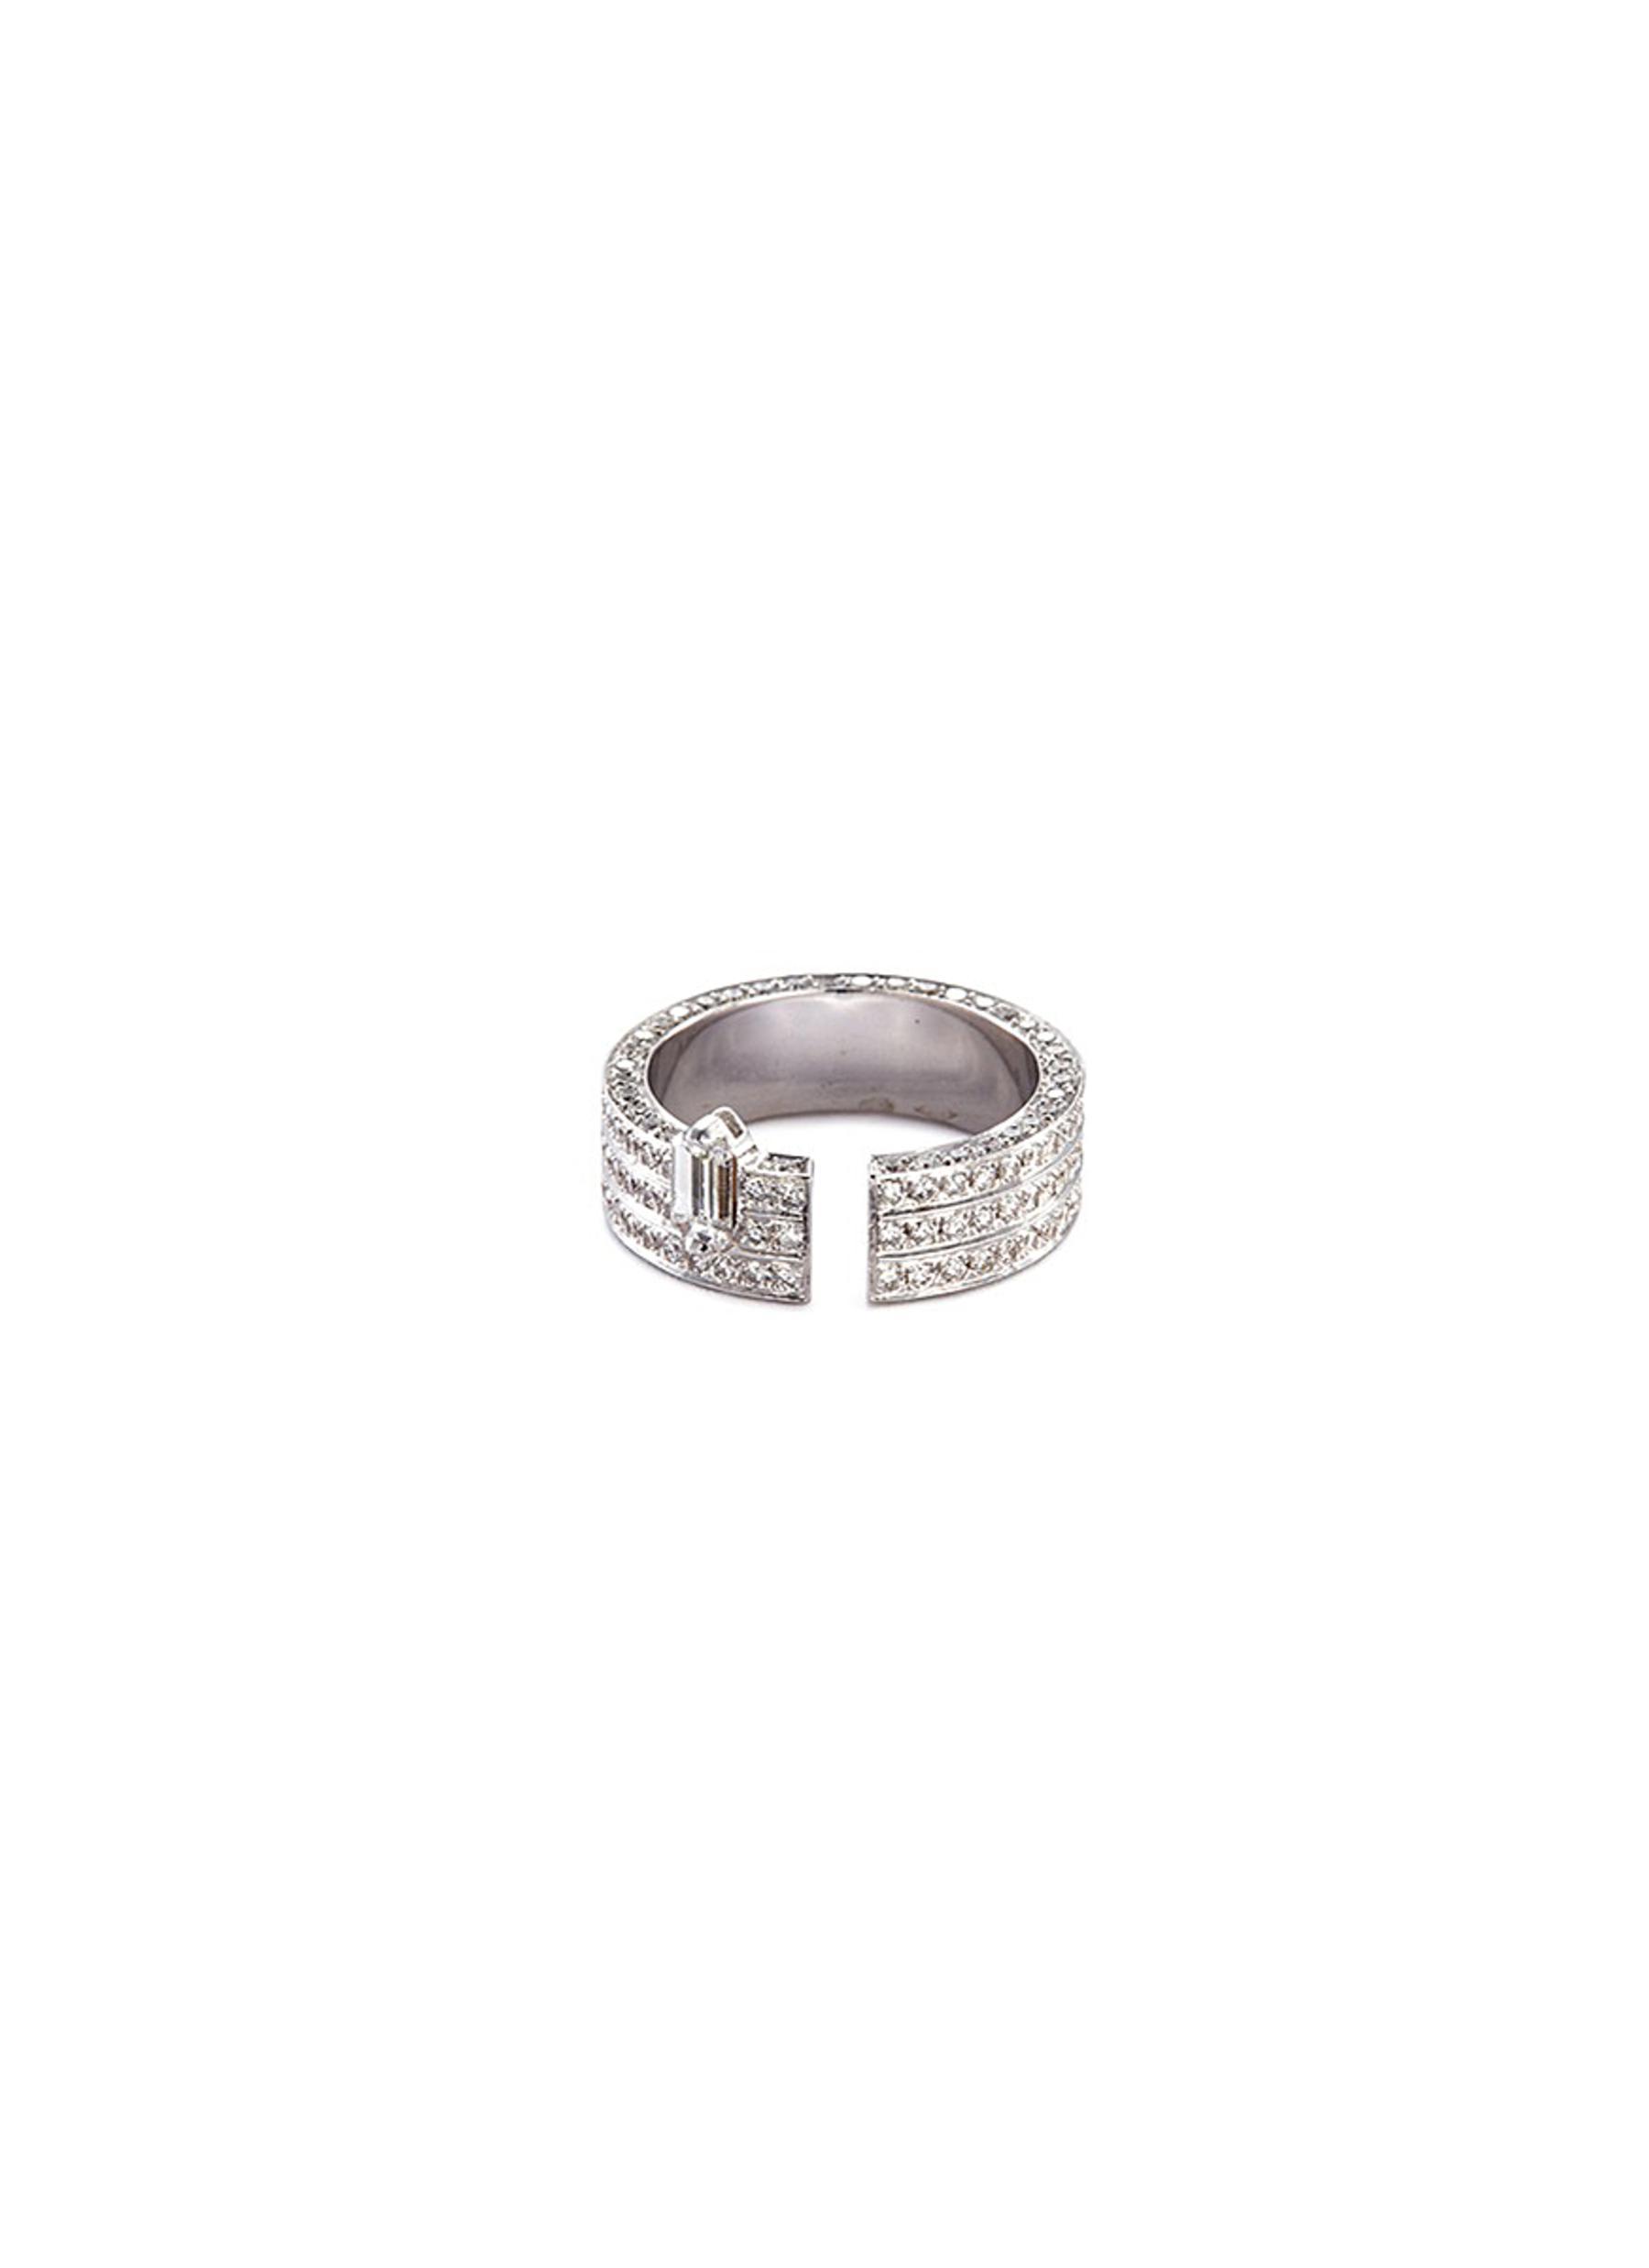 'Disruptive' diamond 18k white gold three tier open ring